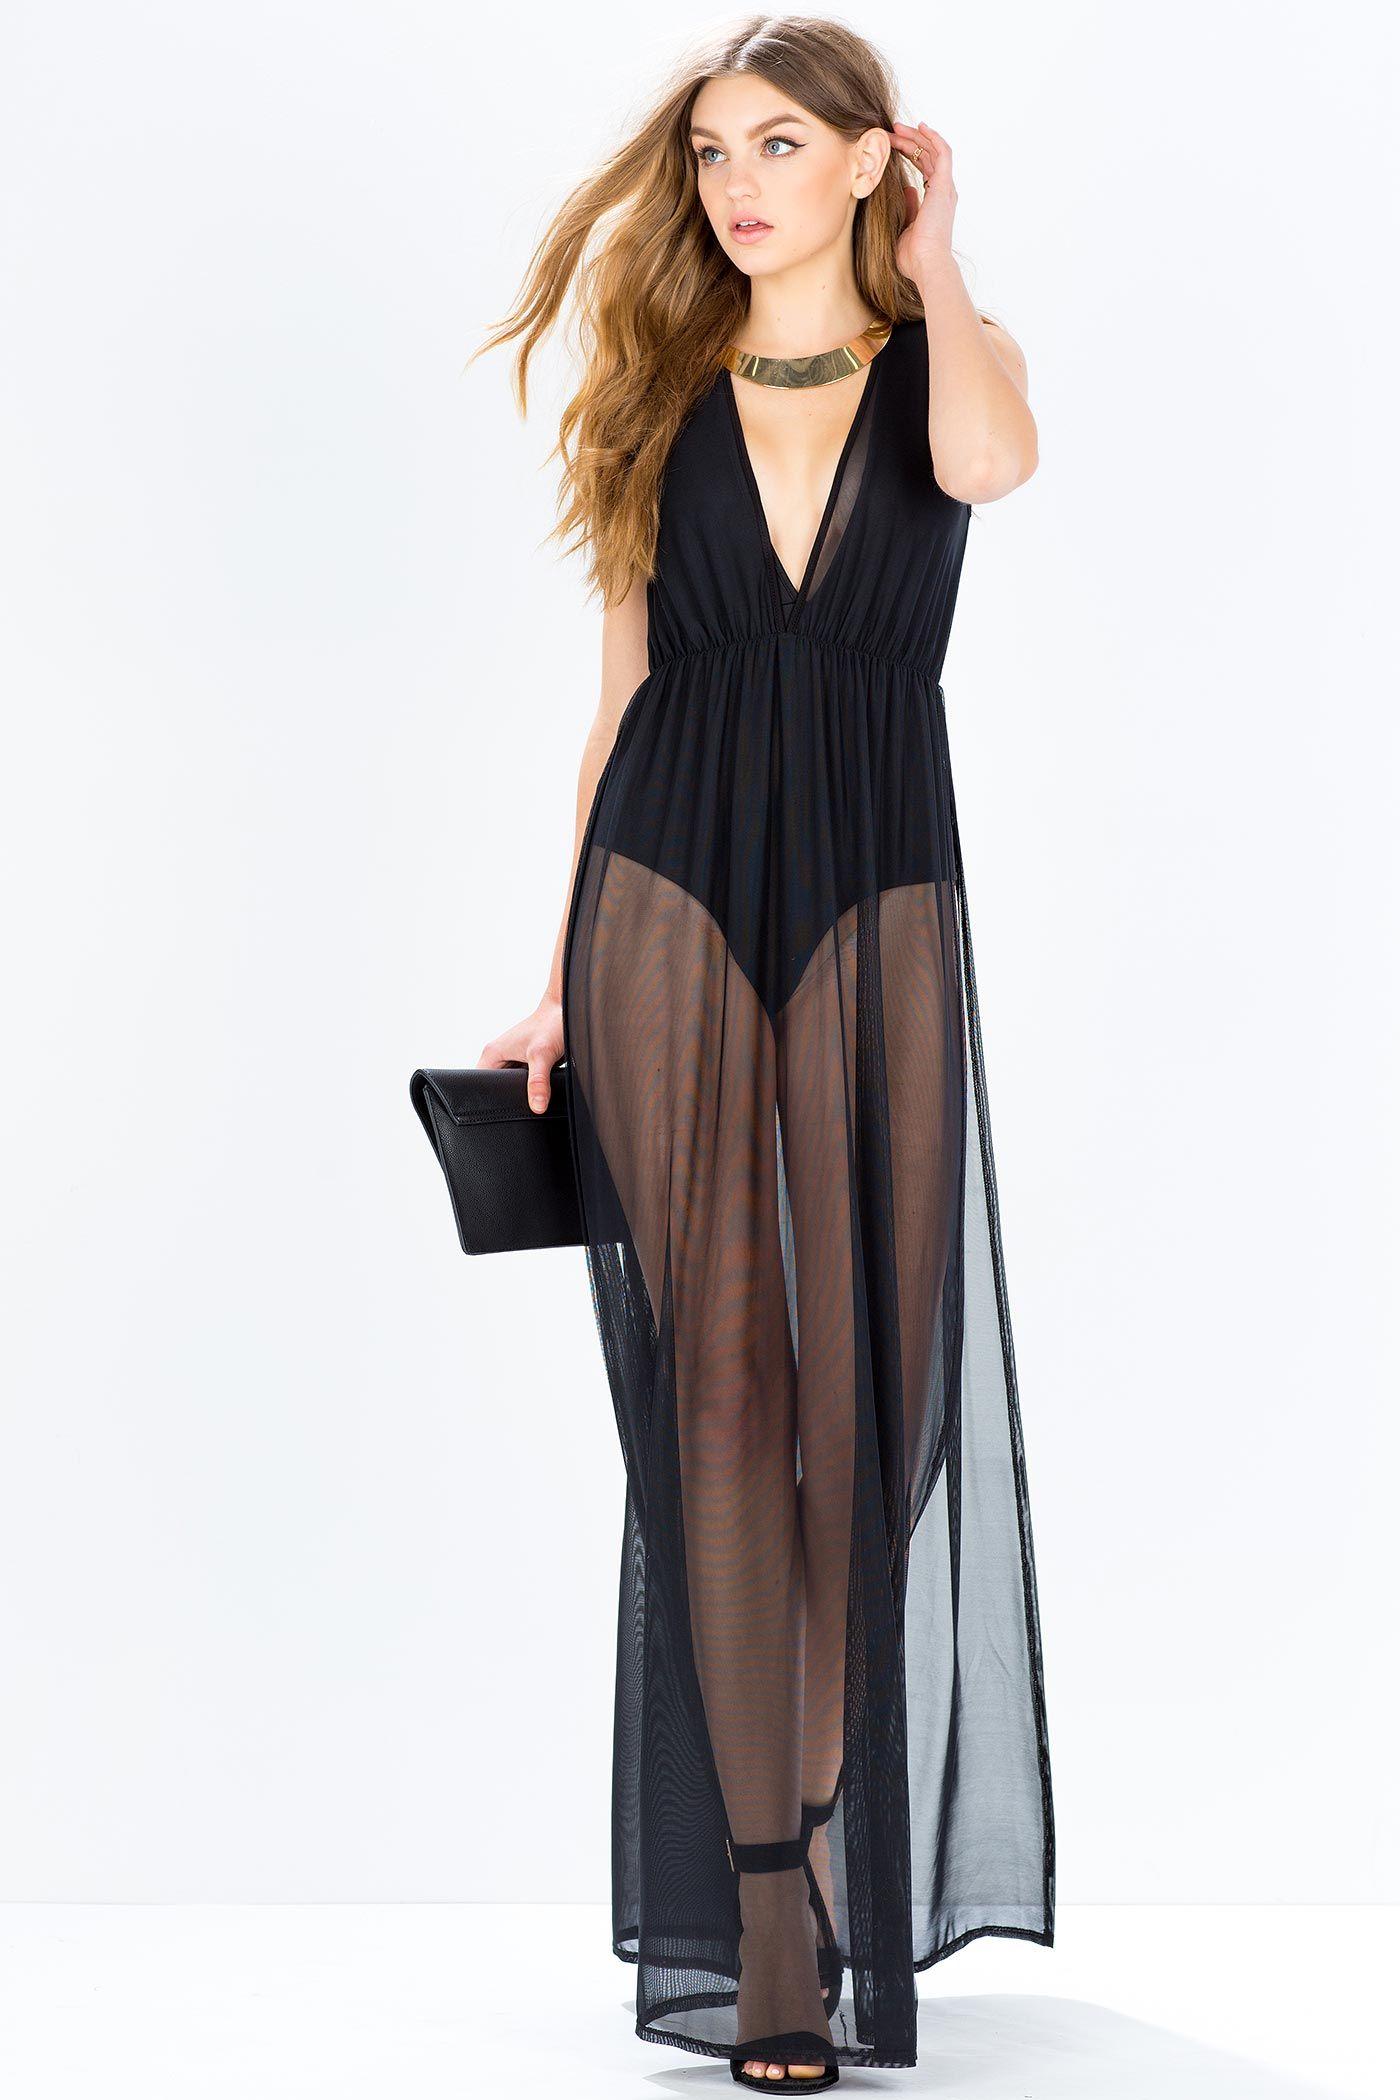 Sheer chiffon black maxi dress